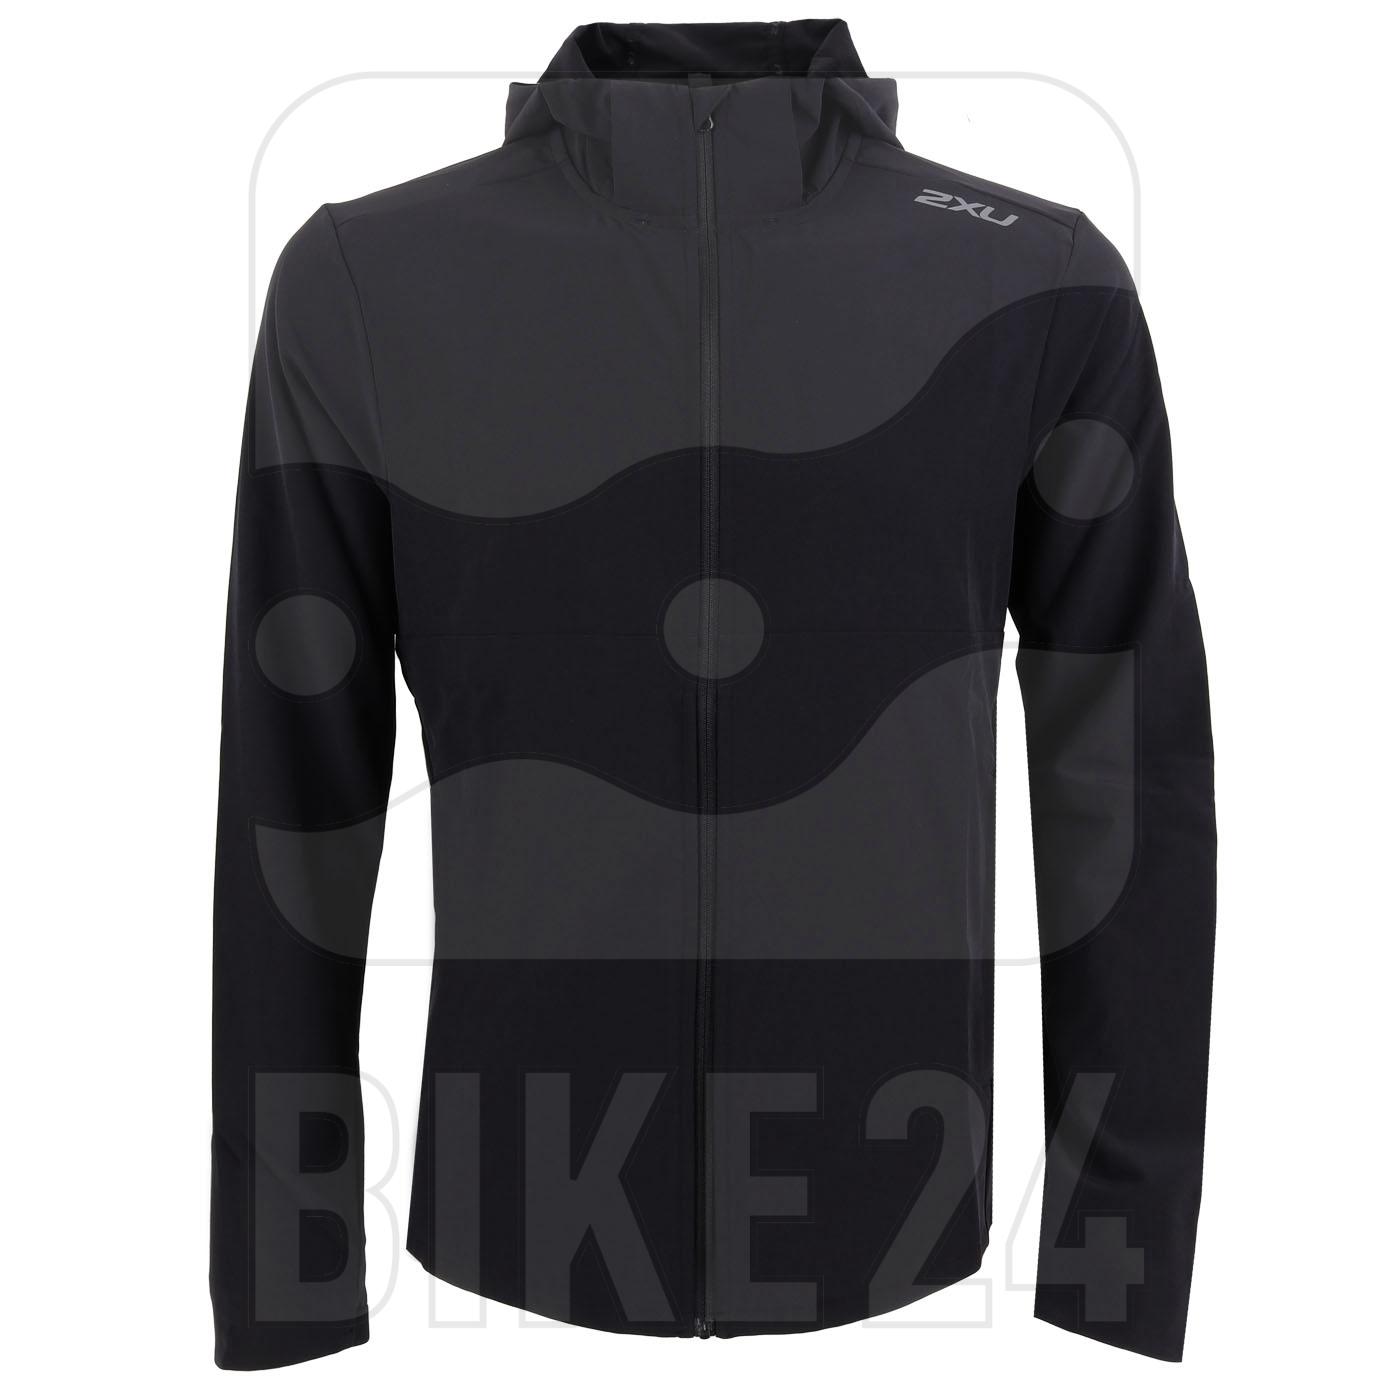 2XU XVENT DWR Chaqueta de correr - black/silver reflective